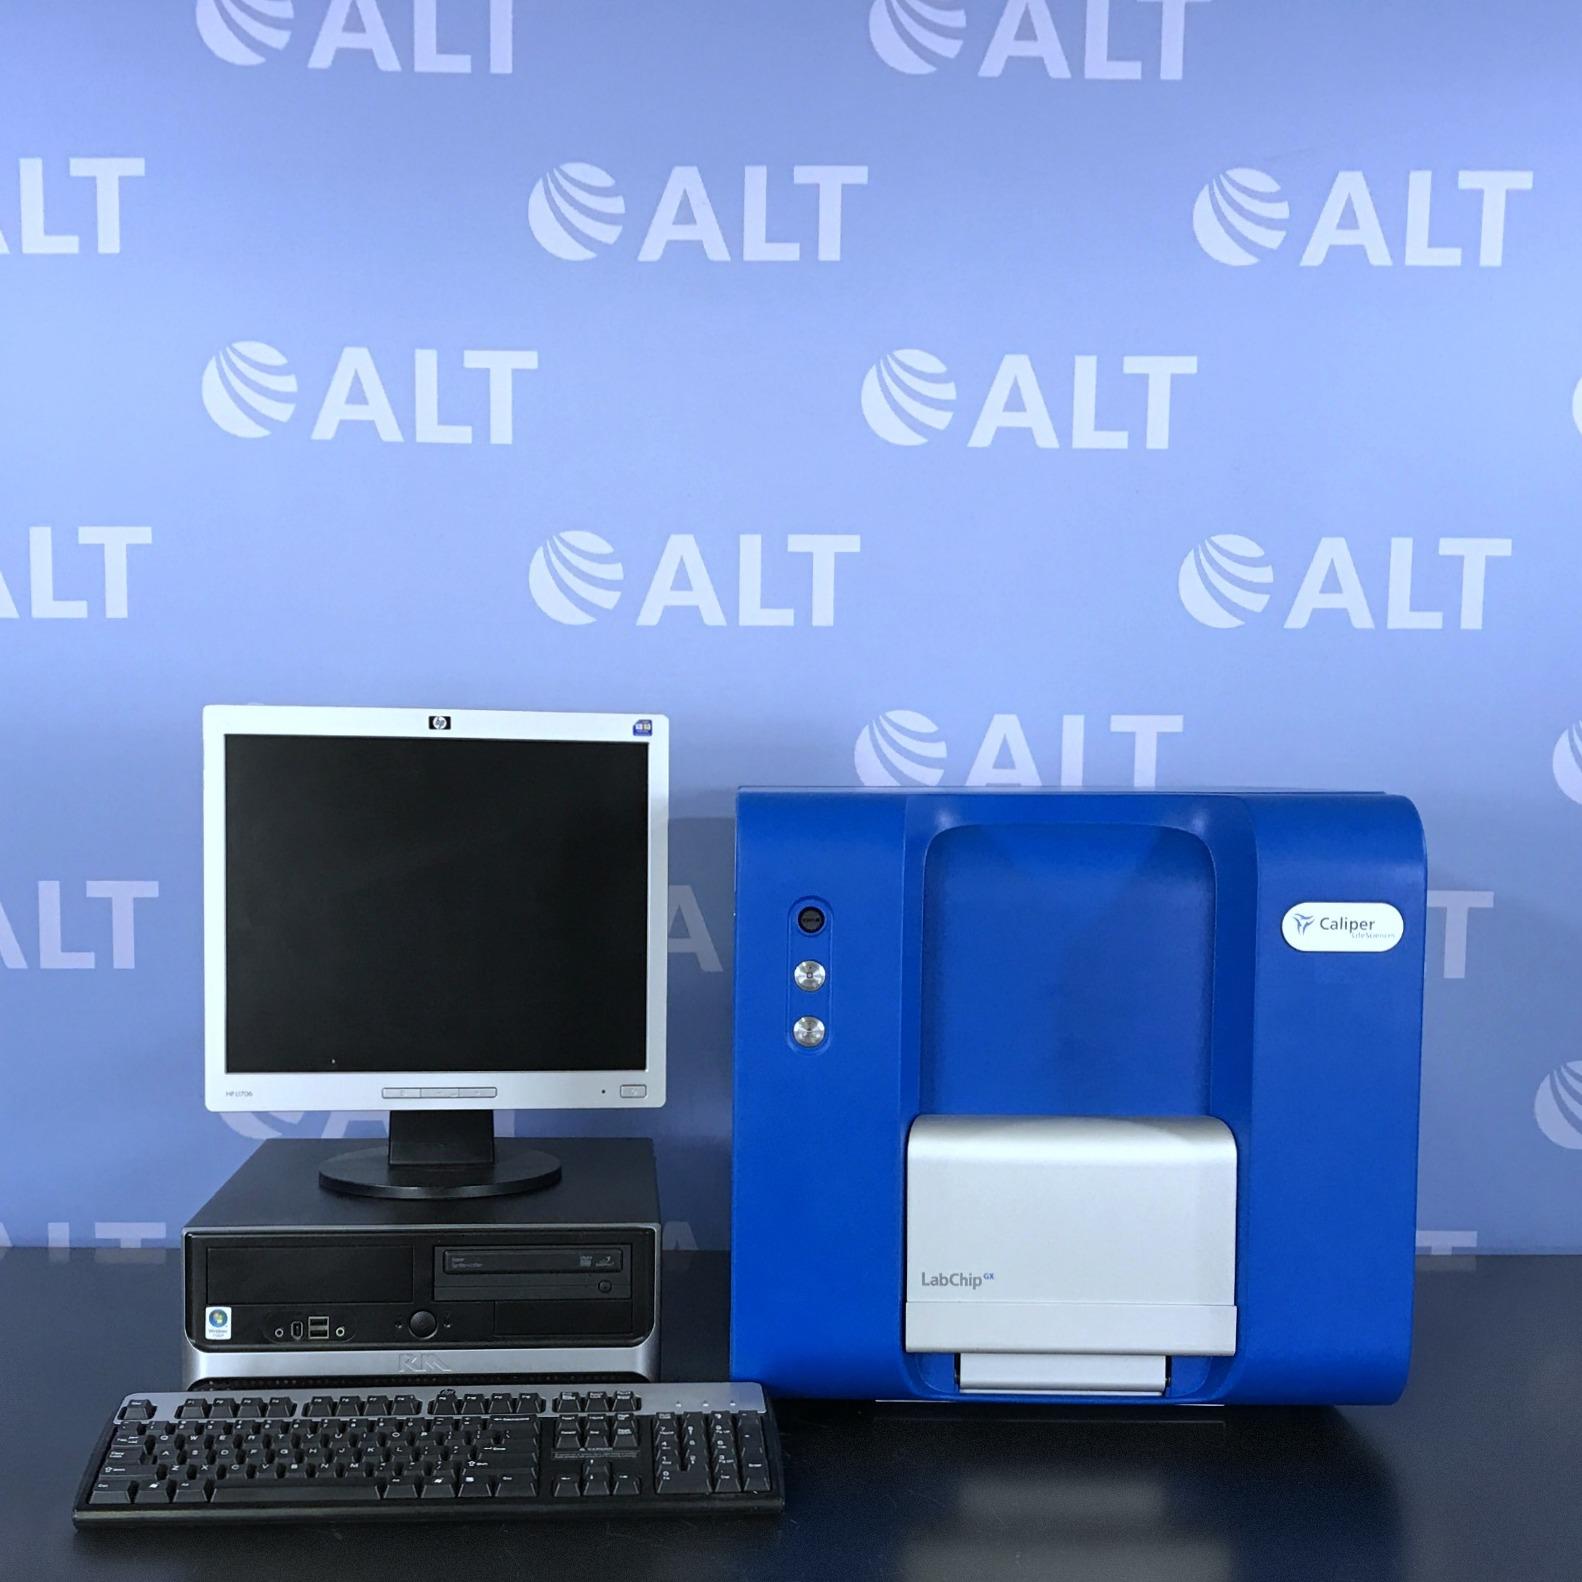 Caliper Life Sciences LabChip GX P/N 122000/B Image